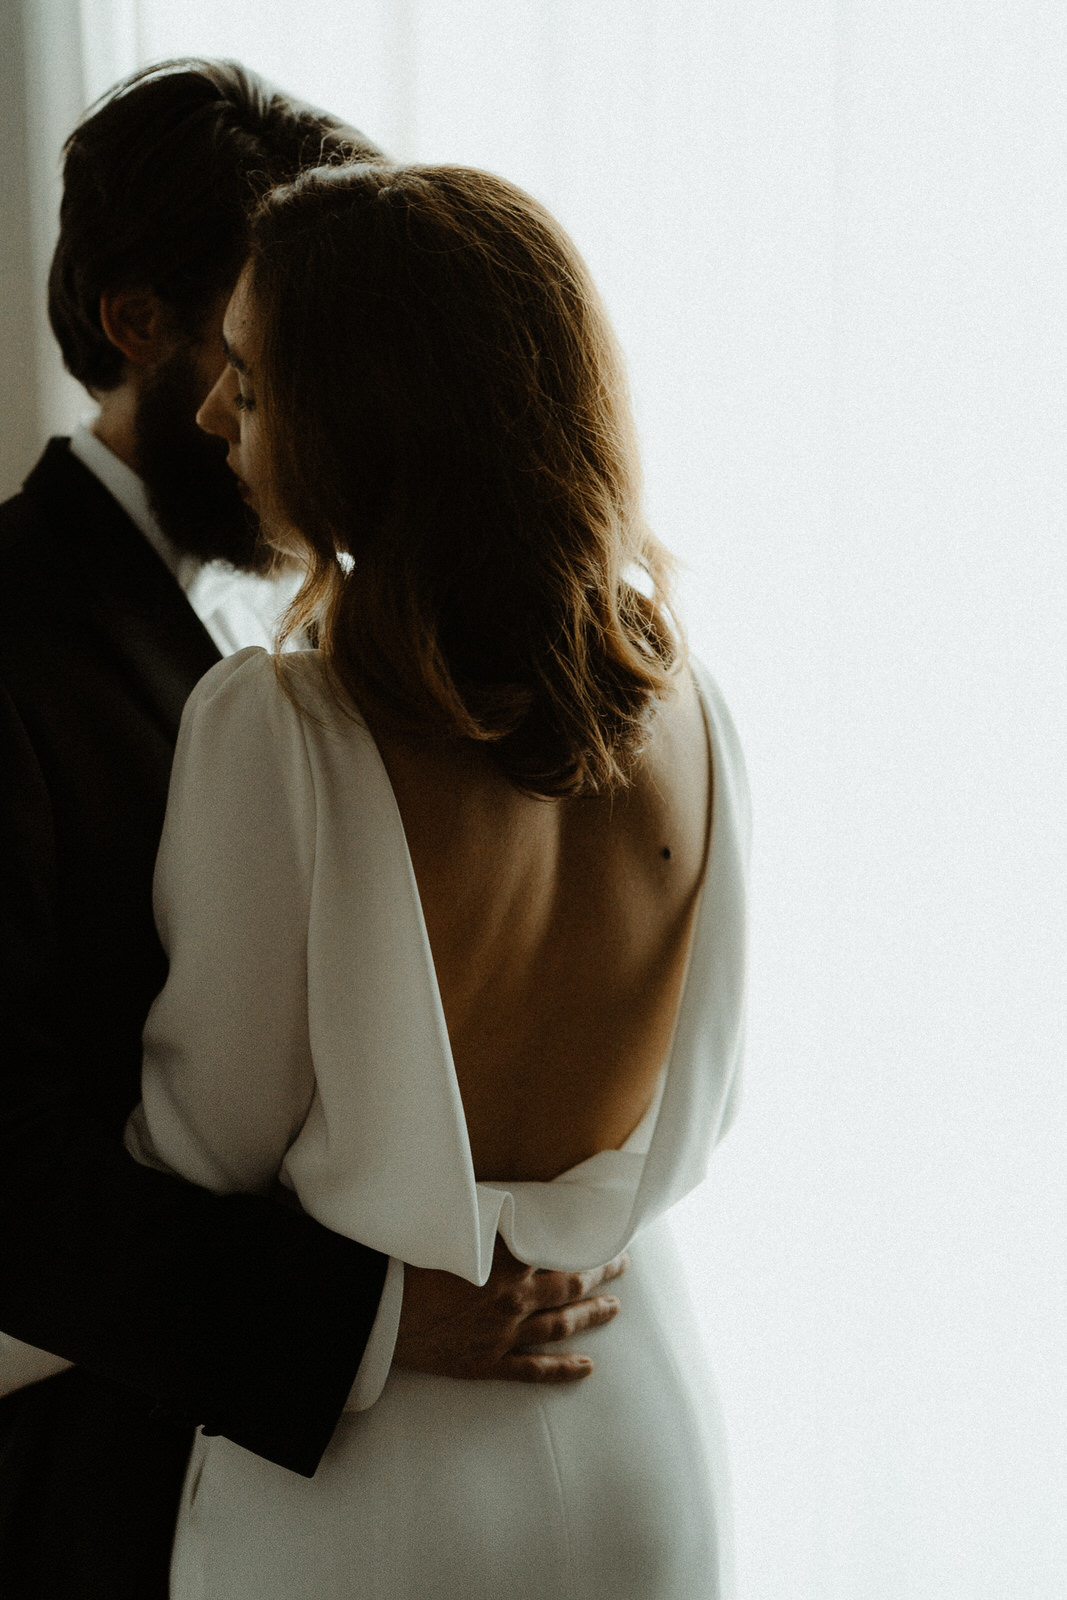 lighting-liking-other-couple